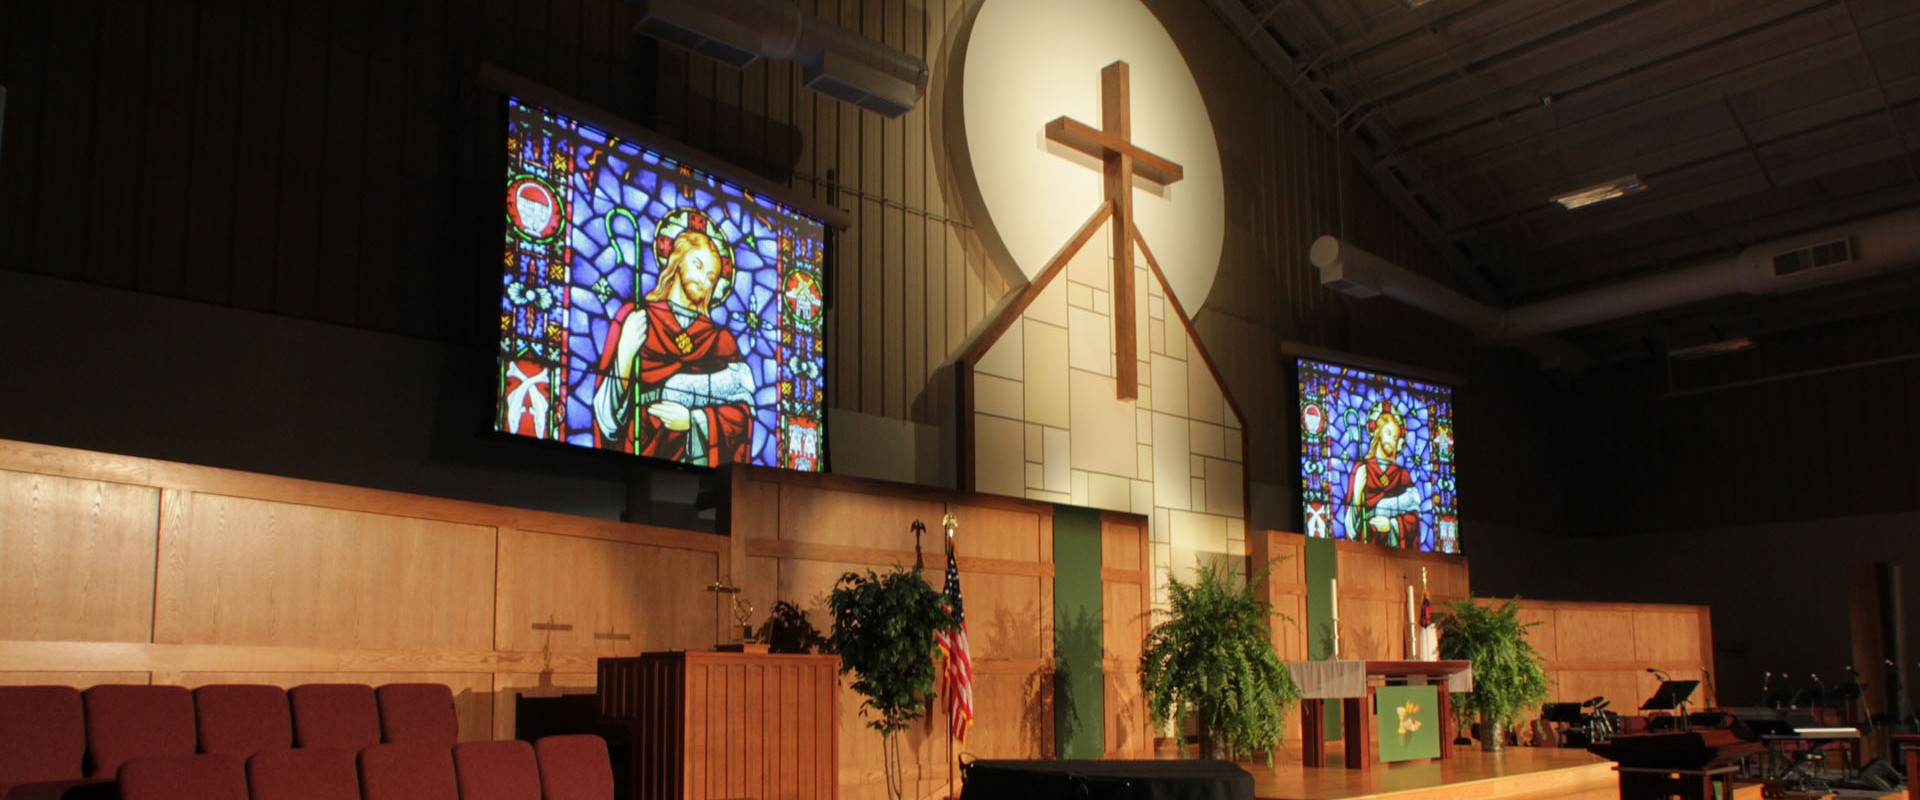 Church Sanctuary Stage